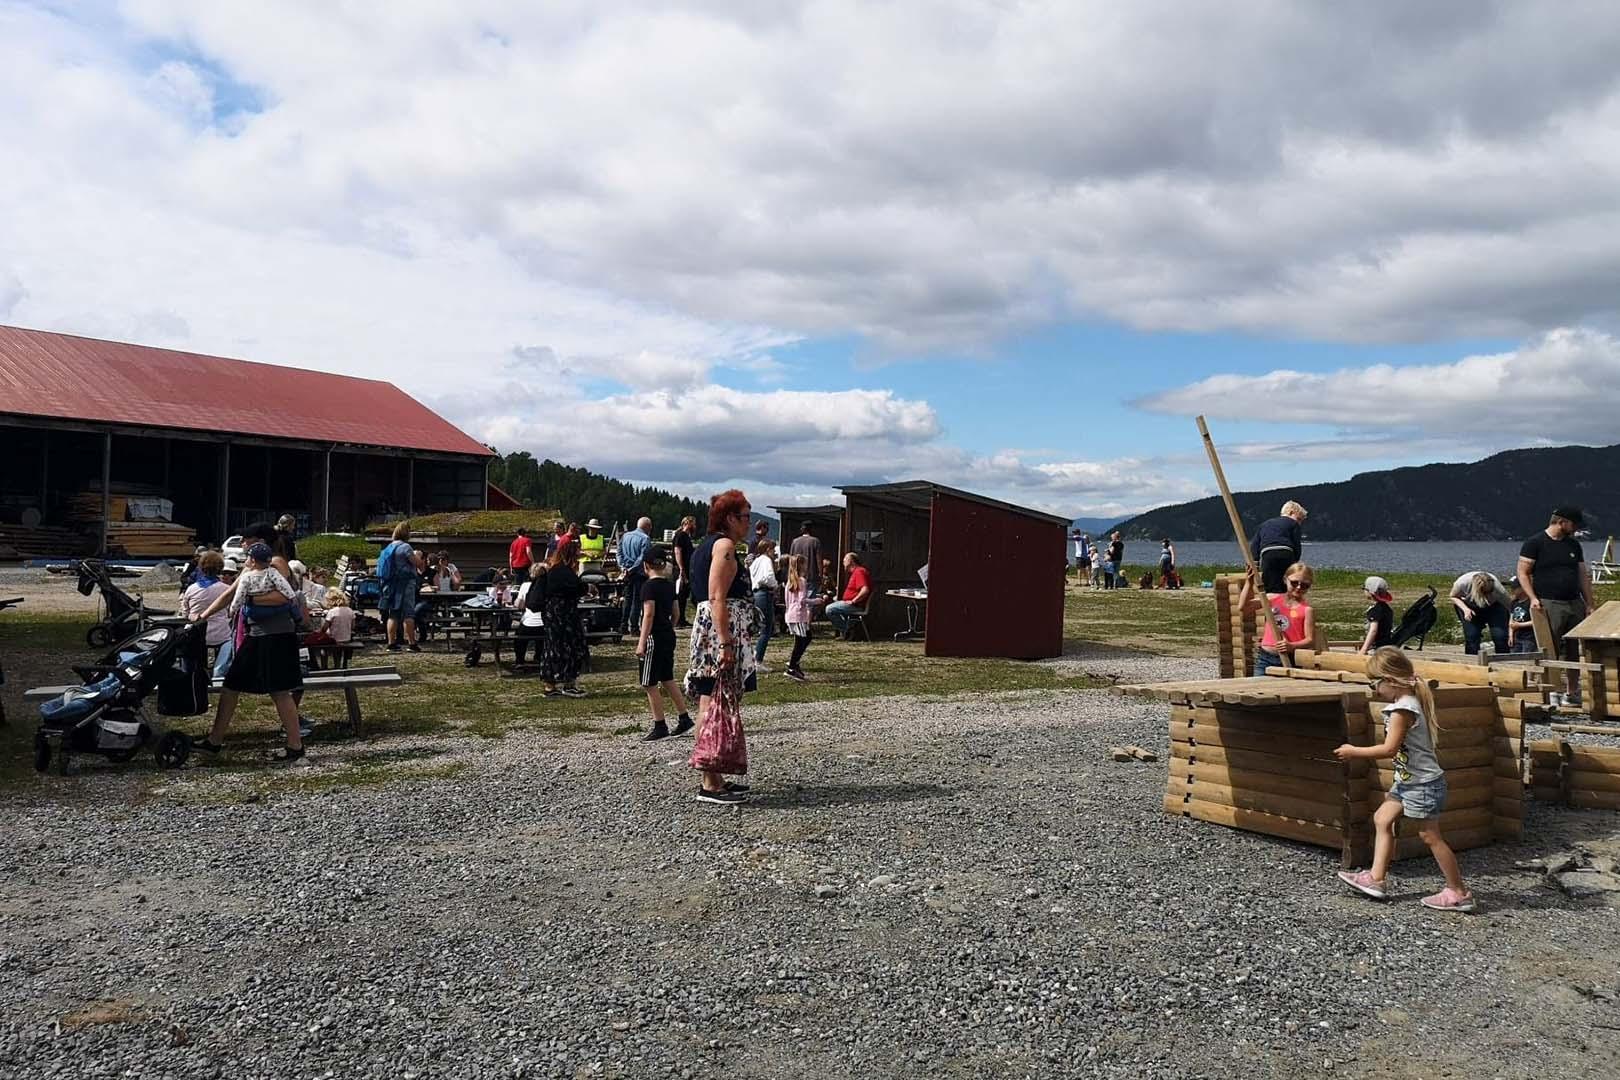 Norsk Sagbruksmuseum: A unique Norwegian time warp